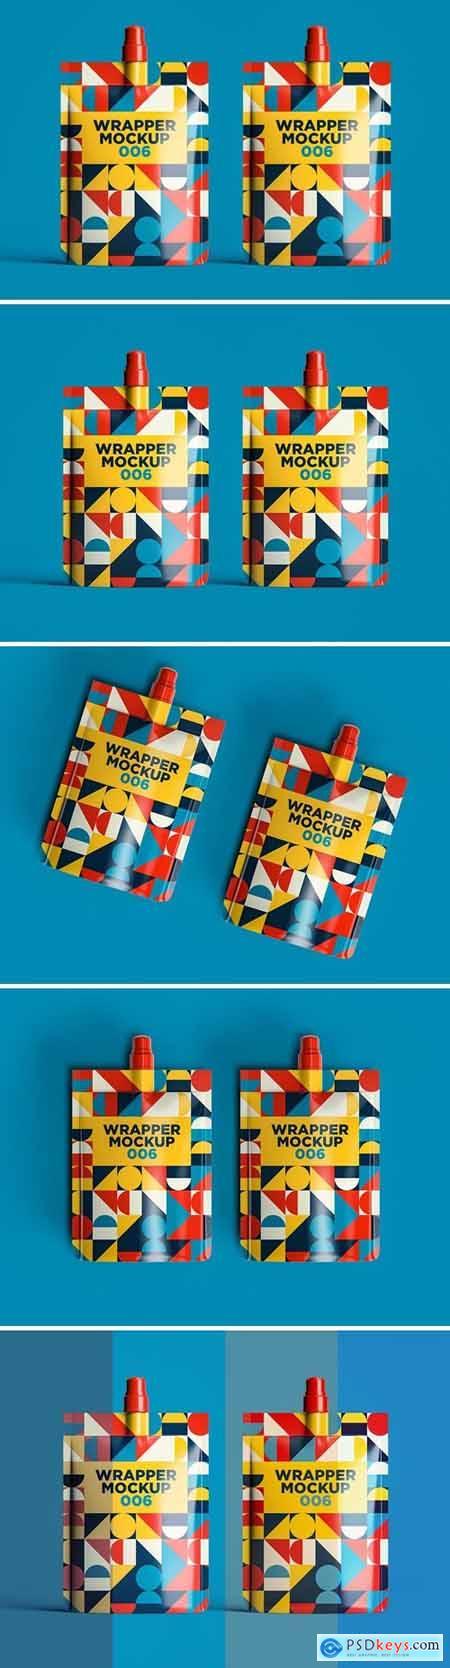 Wrapper Mockup 006